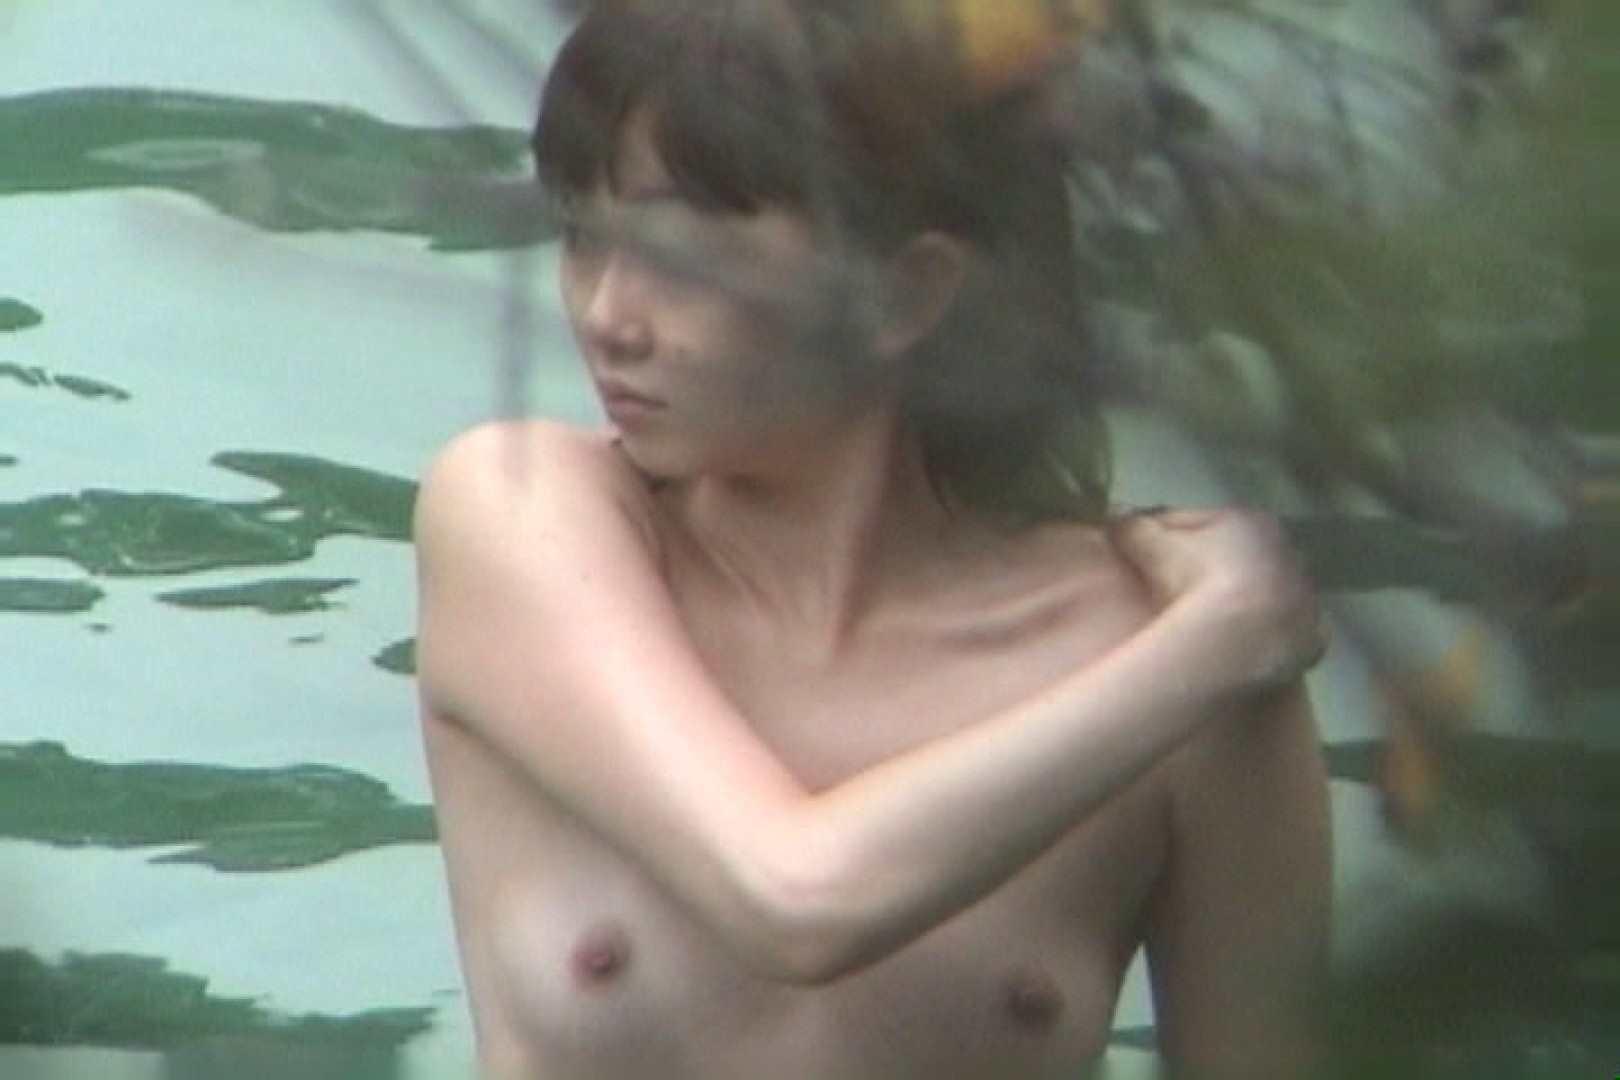 Aquaな露天風呂Vol.71【VIP限定】 露天 | OLセックス  107画像 82